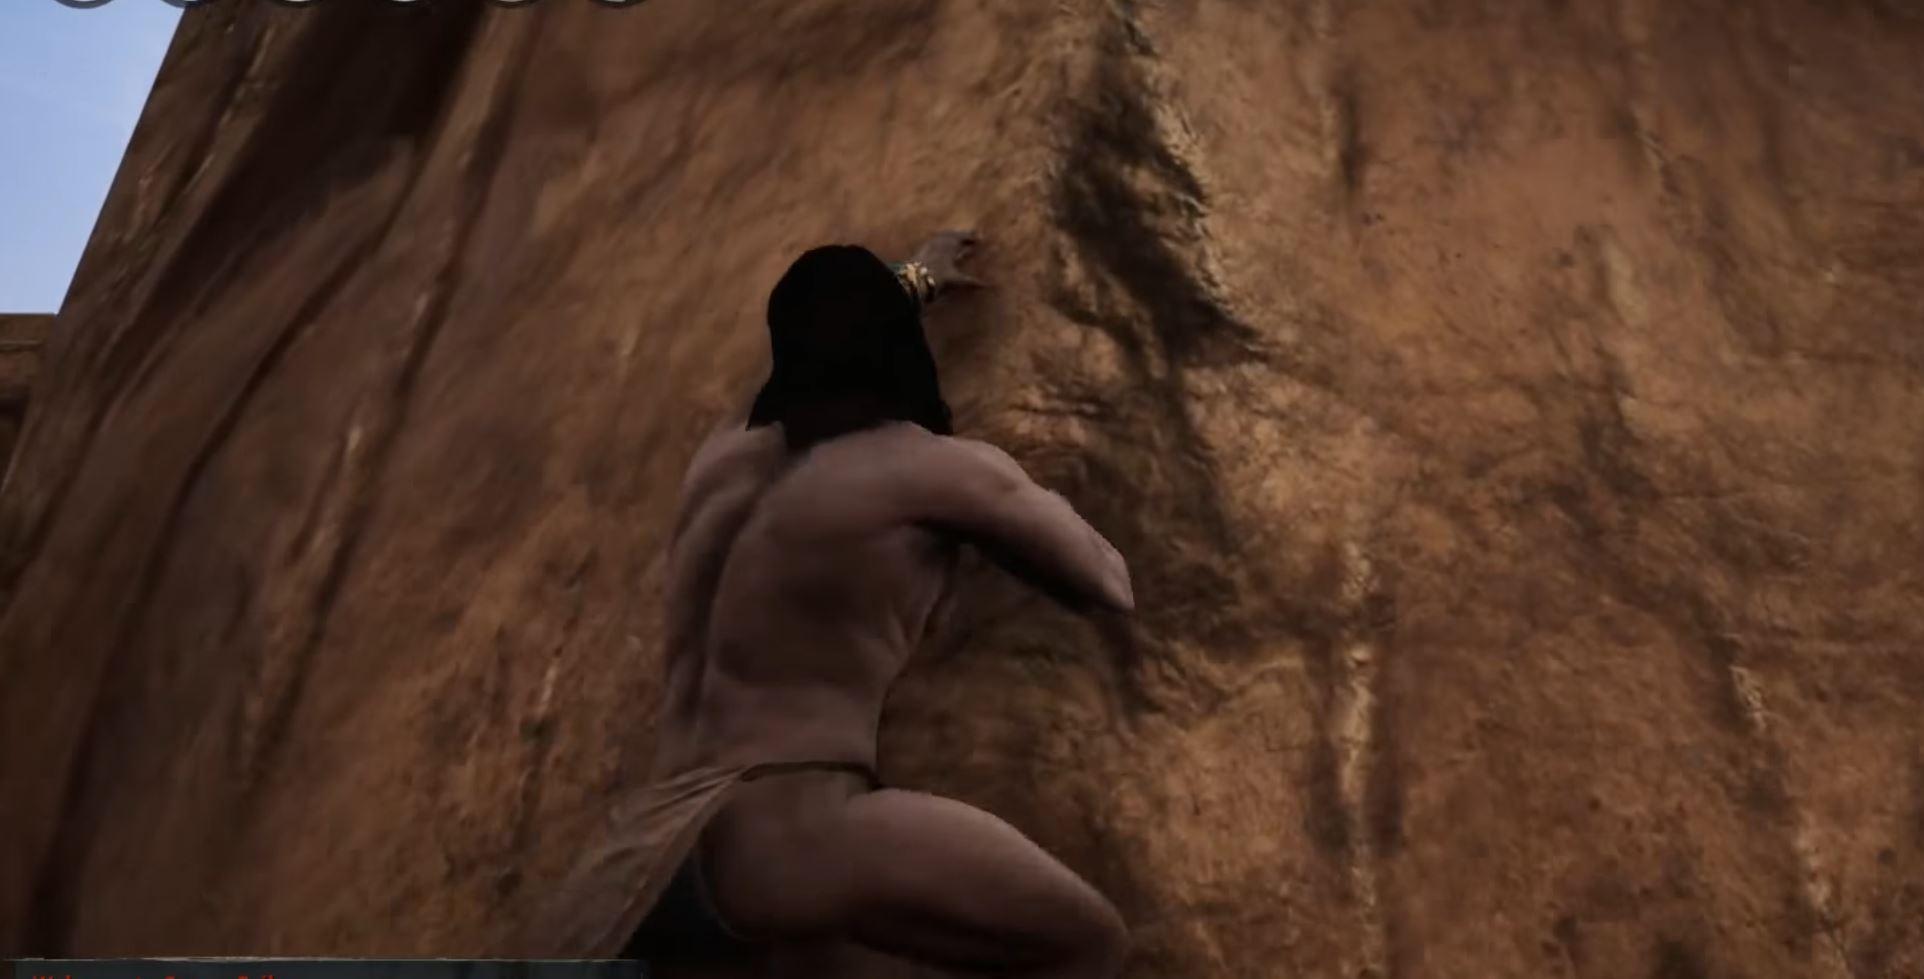 Kletterausrüstung Conan Exiles : Conan exiles kletter feature u barbaren entdecken parcours mein